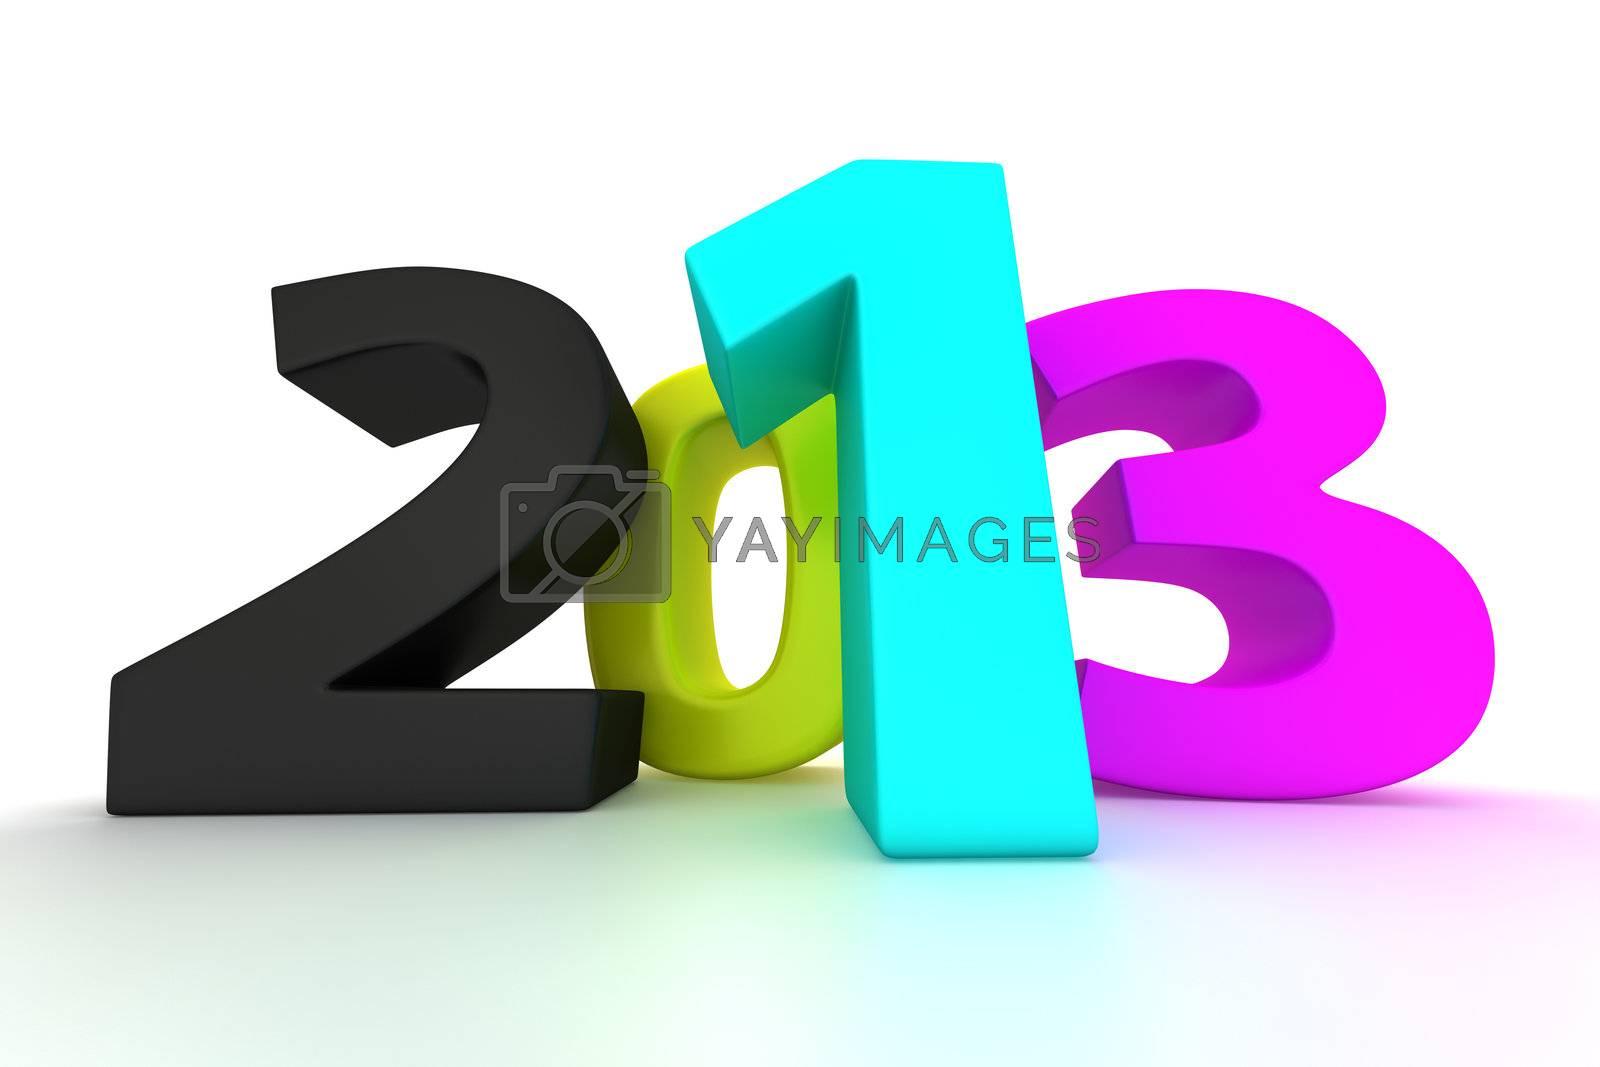 Big CMYK digits 2013 on the white background